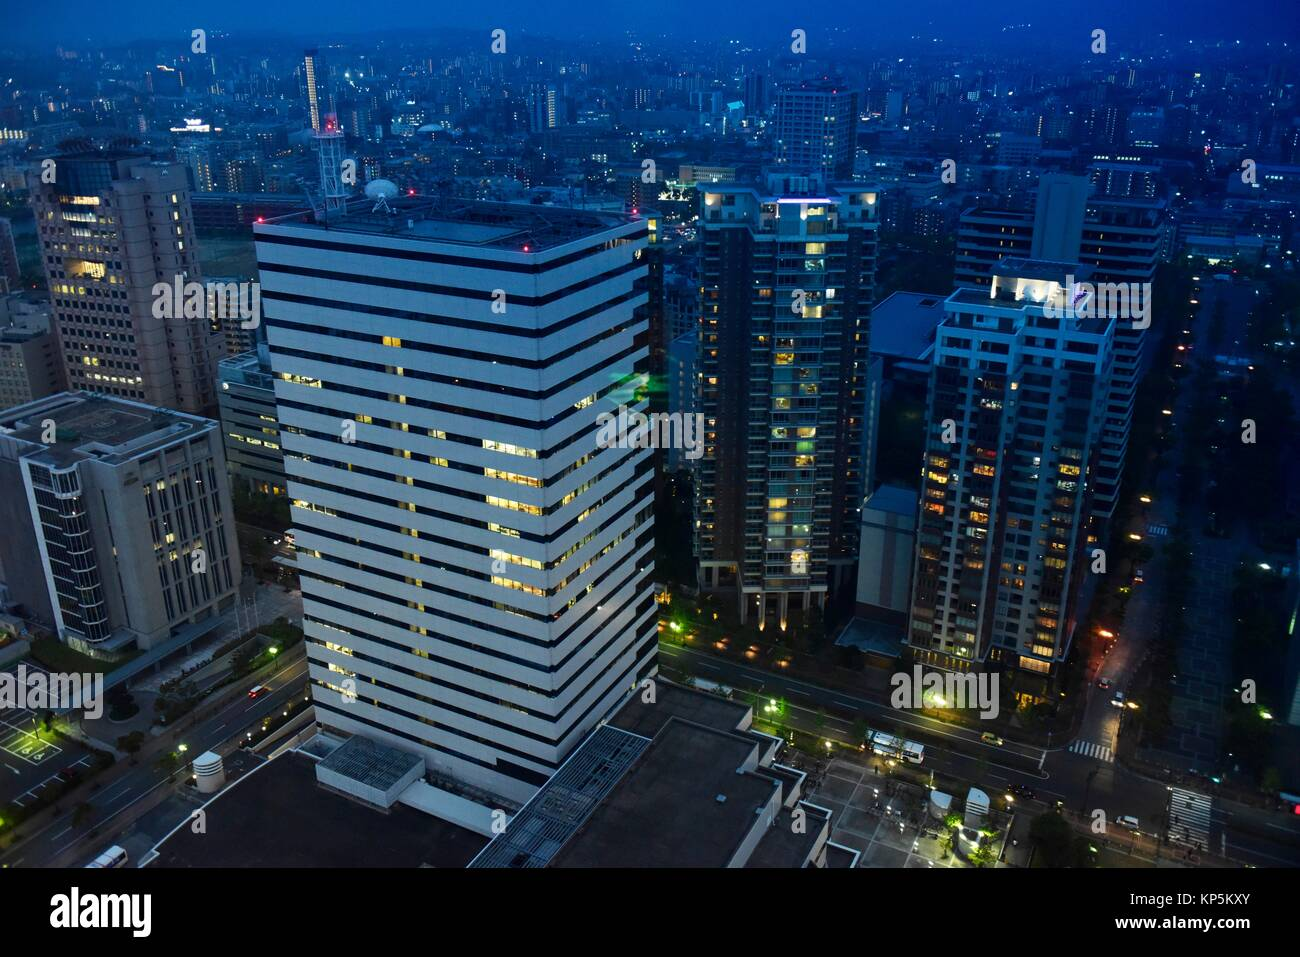 Cityscape of Fukuoka by night, Kyushu, Japan,Asia. - Stock Image